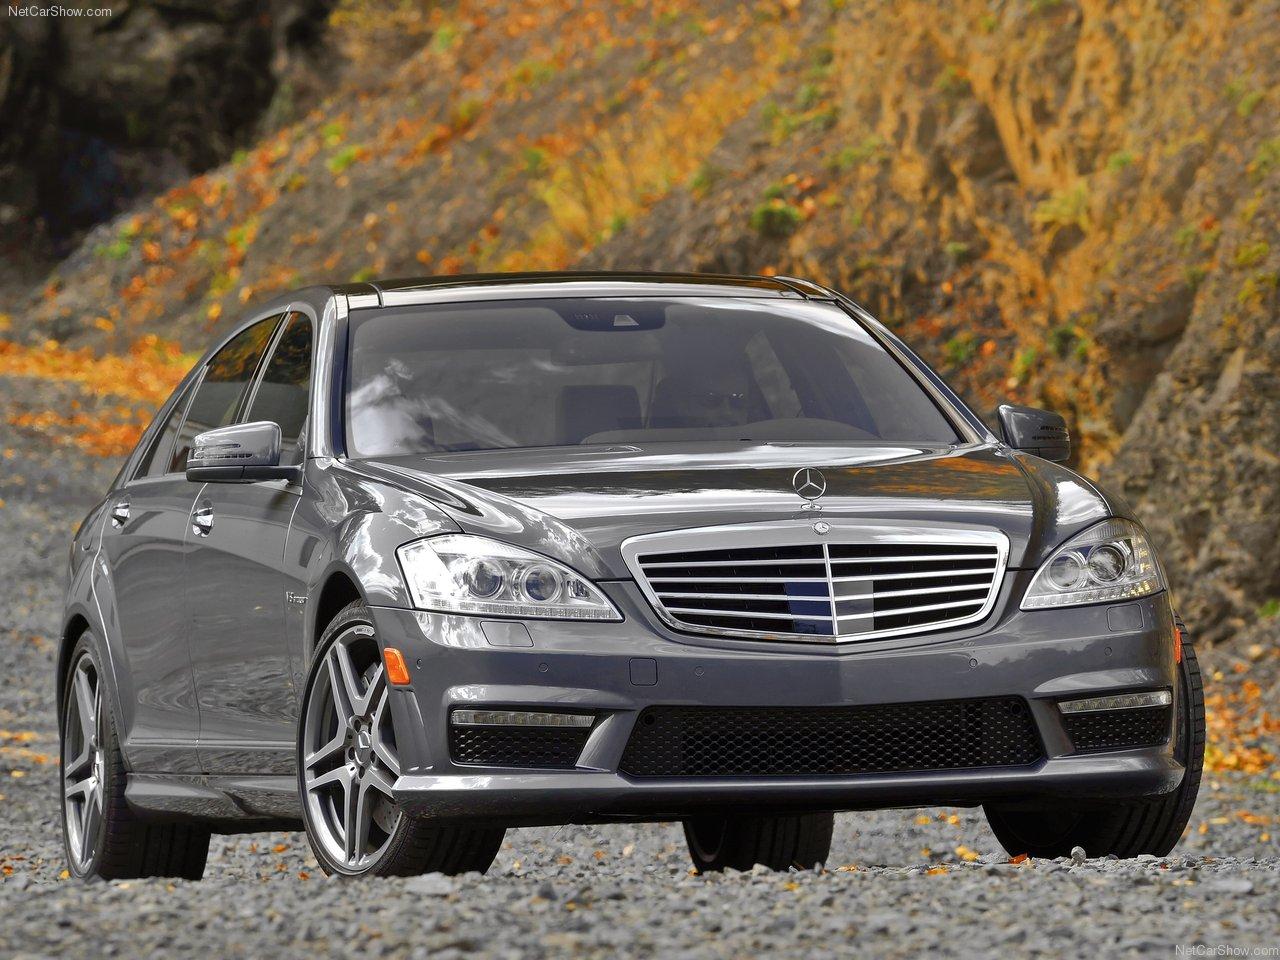 http://1.bp.blogspot.com/-HeG6t_zxYlE/TWEPjkkveCI/AAAAAAACKJA/vgMIqHOI3Mw/s1600/Mercedes-Benz-S63_AMG_2011_1280x960_wallpaper_03.jpg